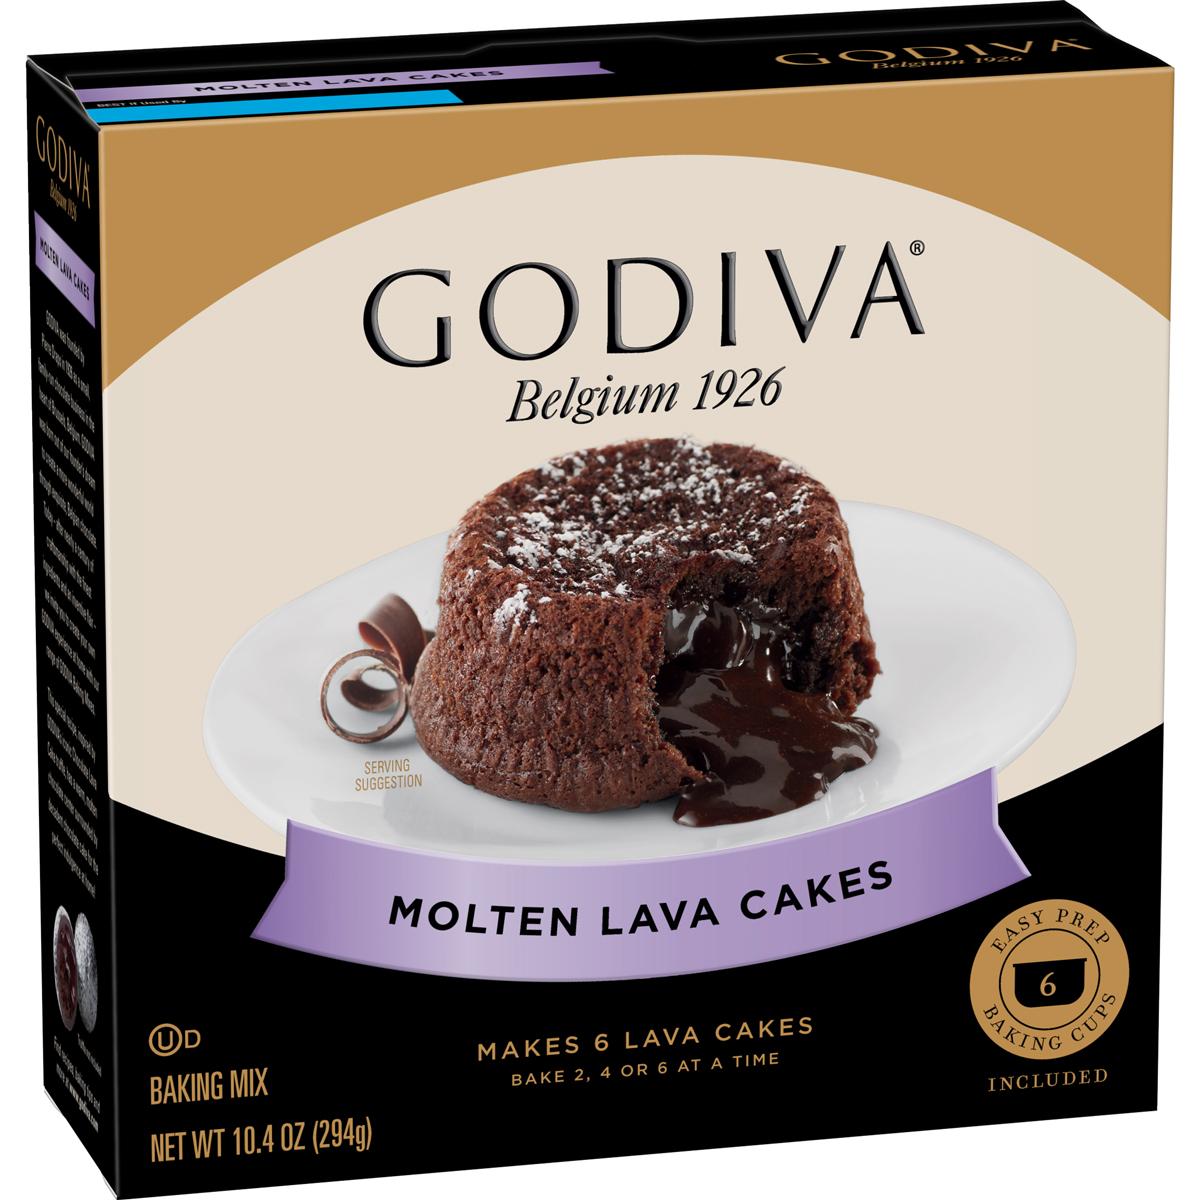 Godiva baking mixes